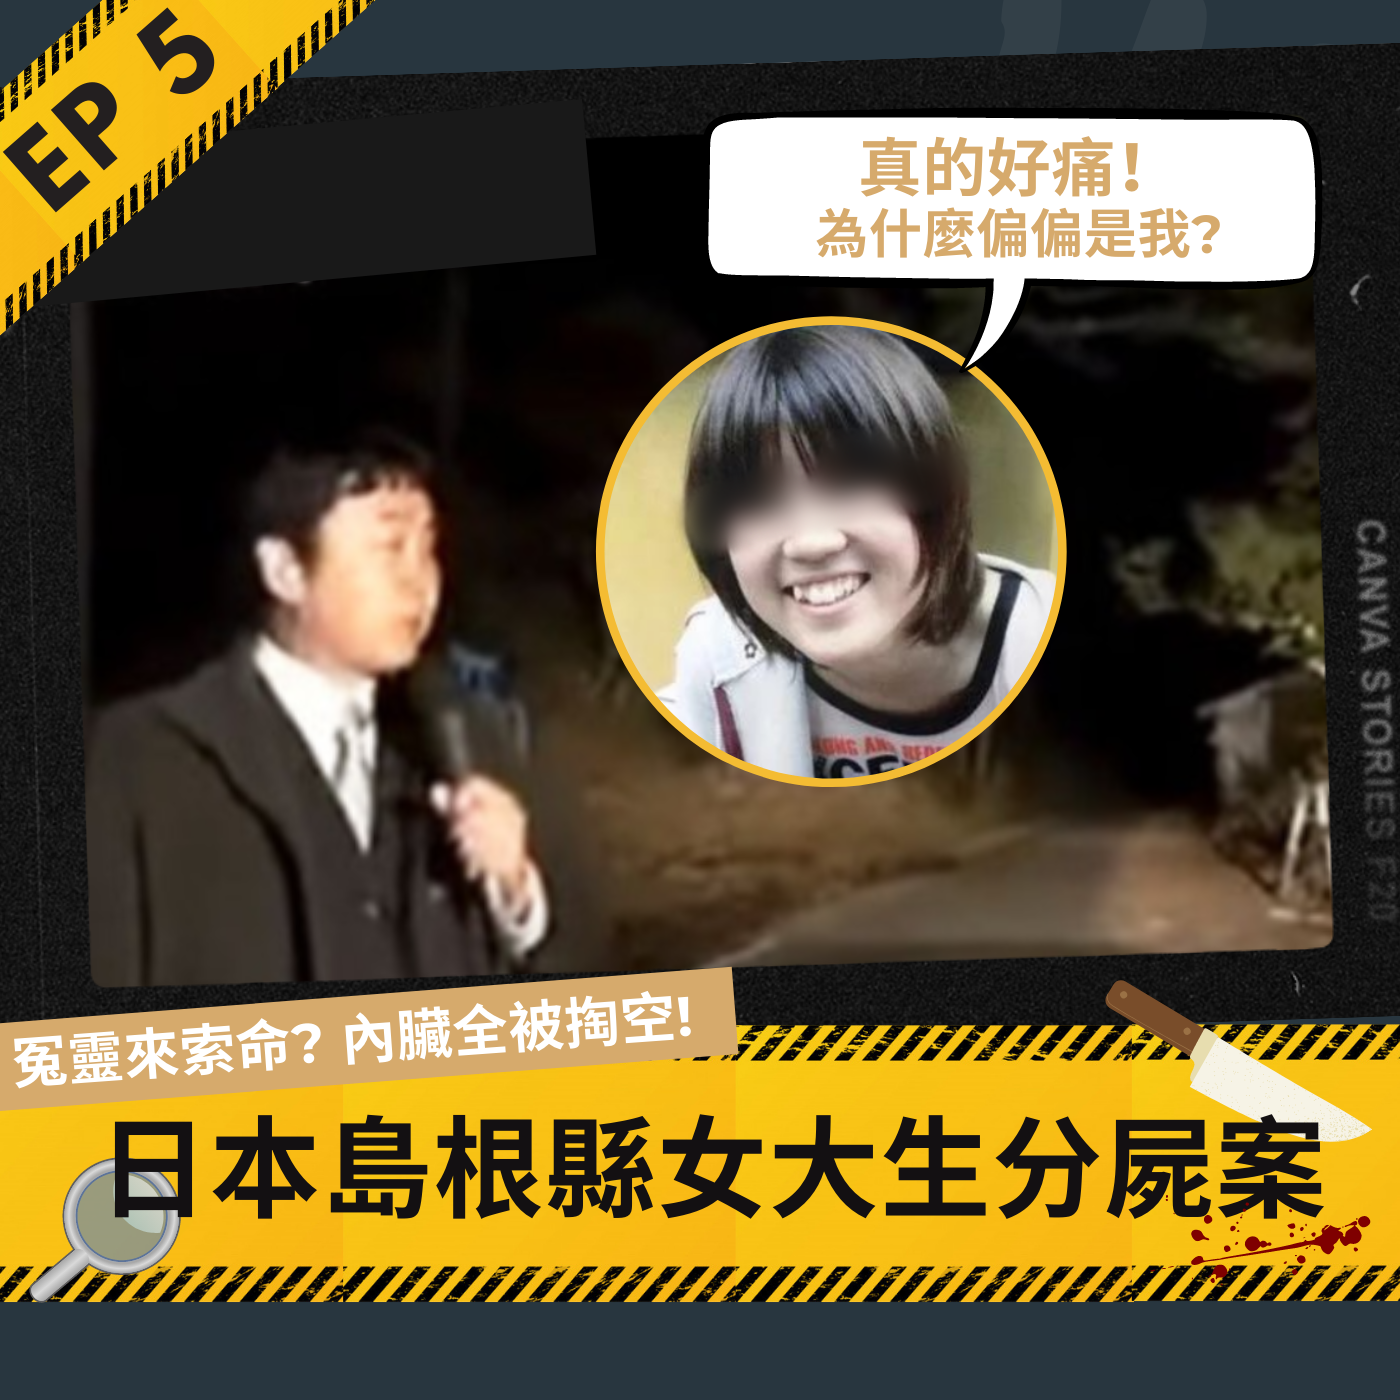 EP5 - 日本懸了7年的恐怖命案! 19歲的死者下班後忽然失踪,屍體被肢解,內臟被掏空棄屍在山中。7年後才發現原來兇手早已經... | 【日本島根縣女大生分屍案】